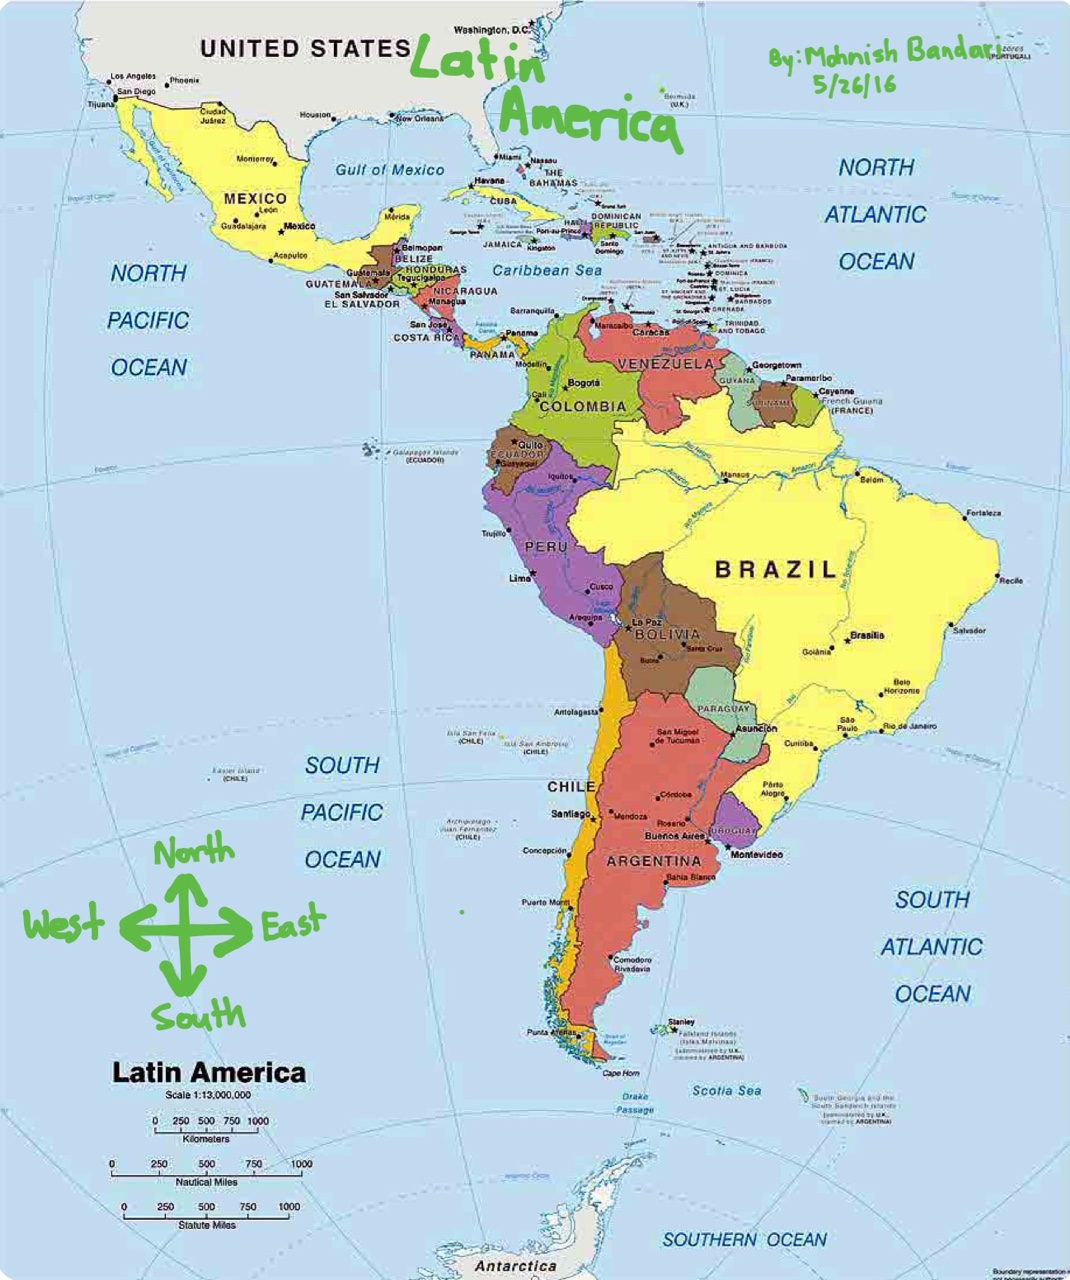 South America: Latin America Project